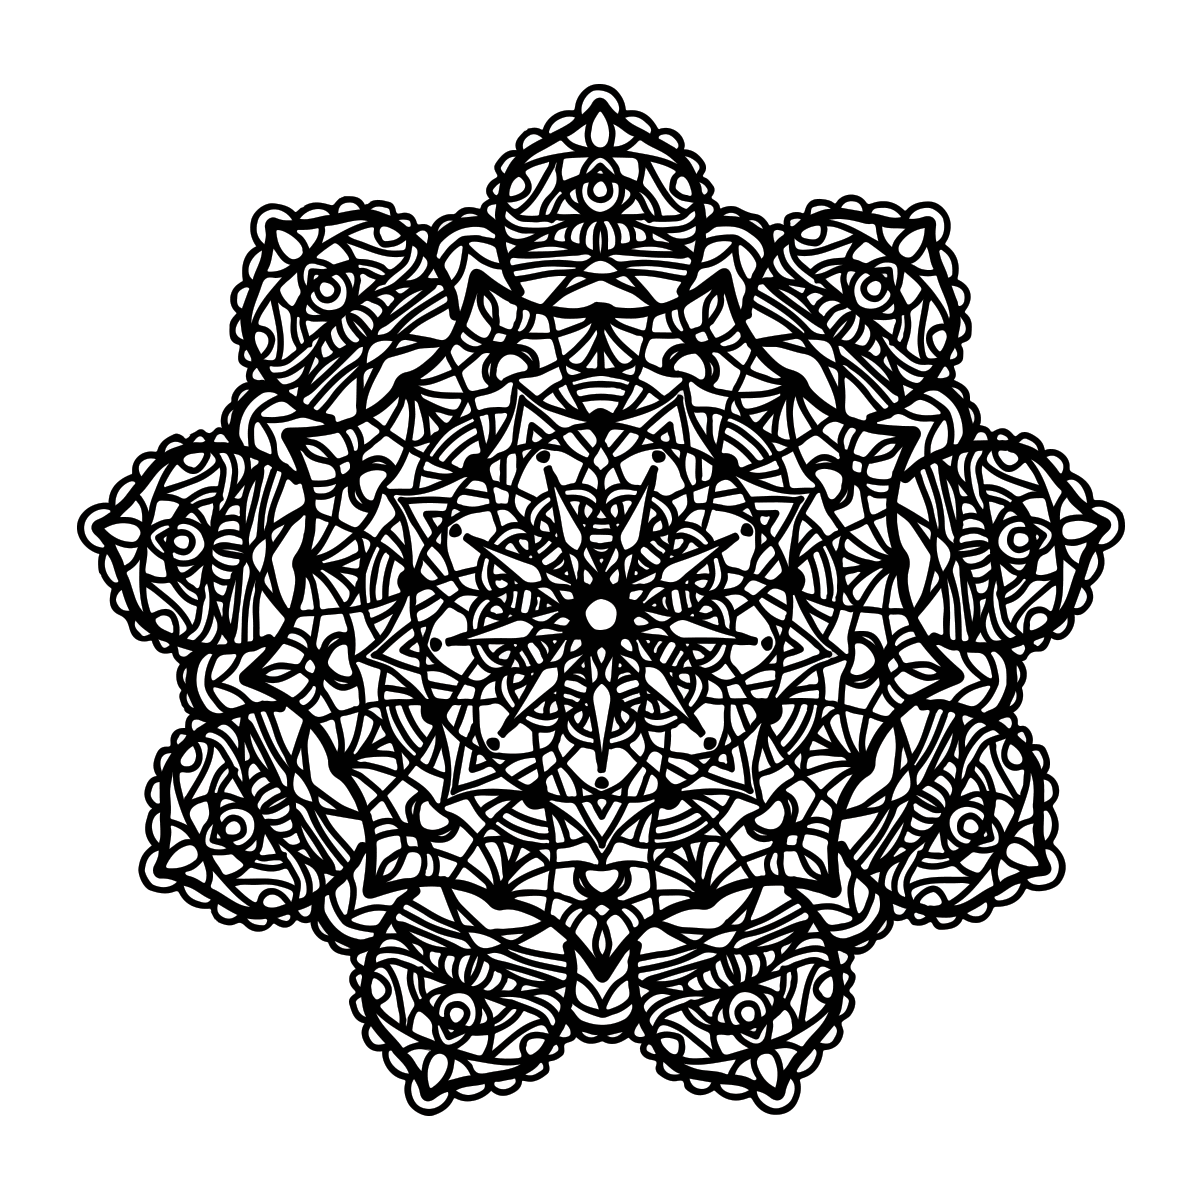 Mandala Coloring Page LT3